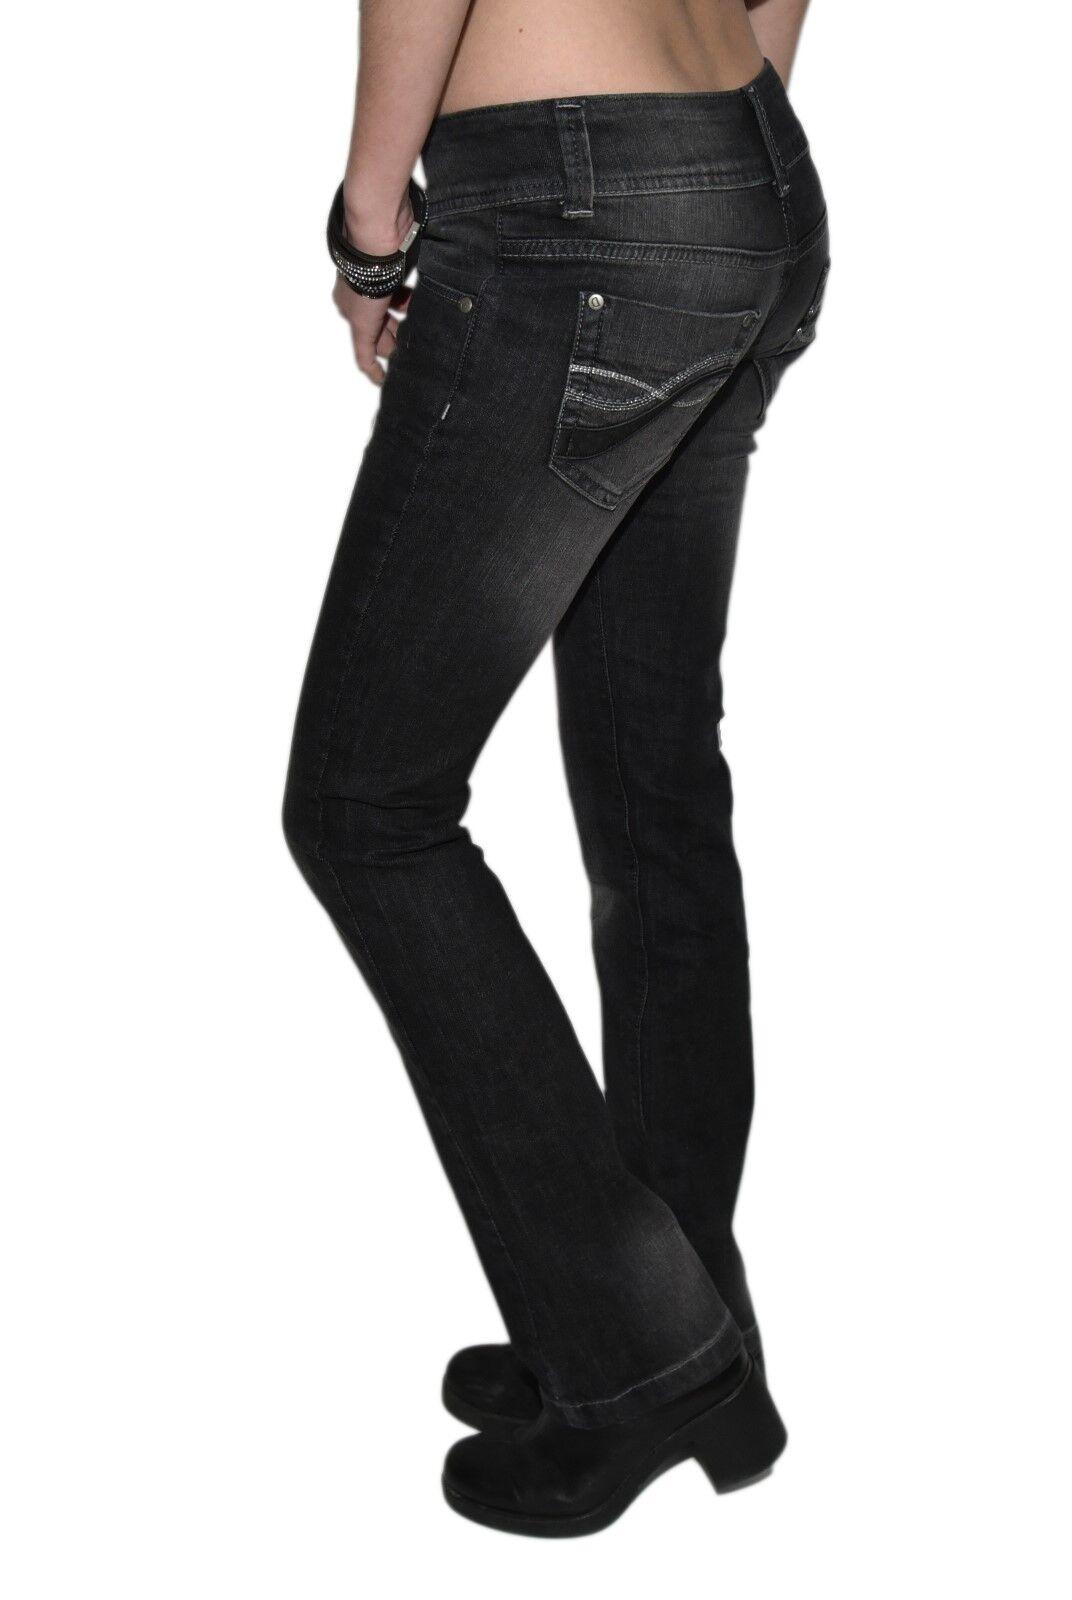 Damen Jeans Hose Hüfthose Schwarz Denim Stoff Straight Leg 2%Stretch Decon-Lisa-